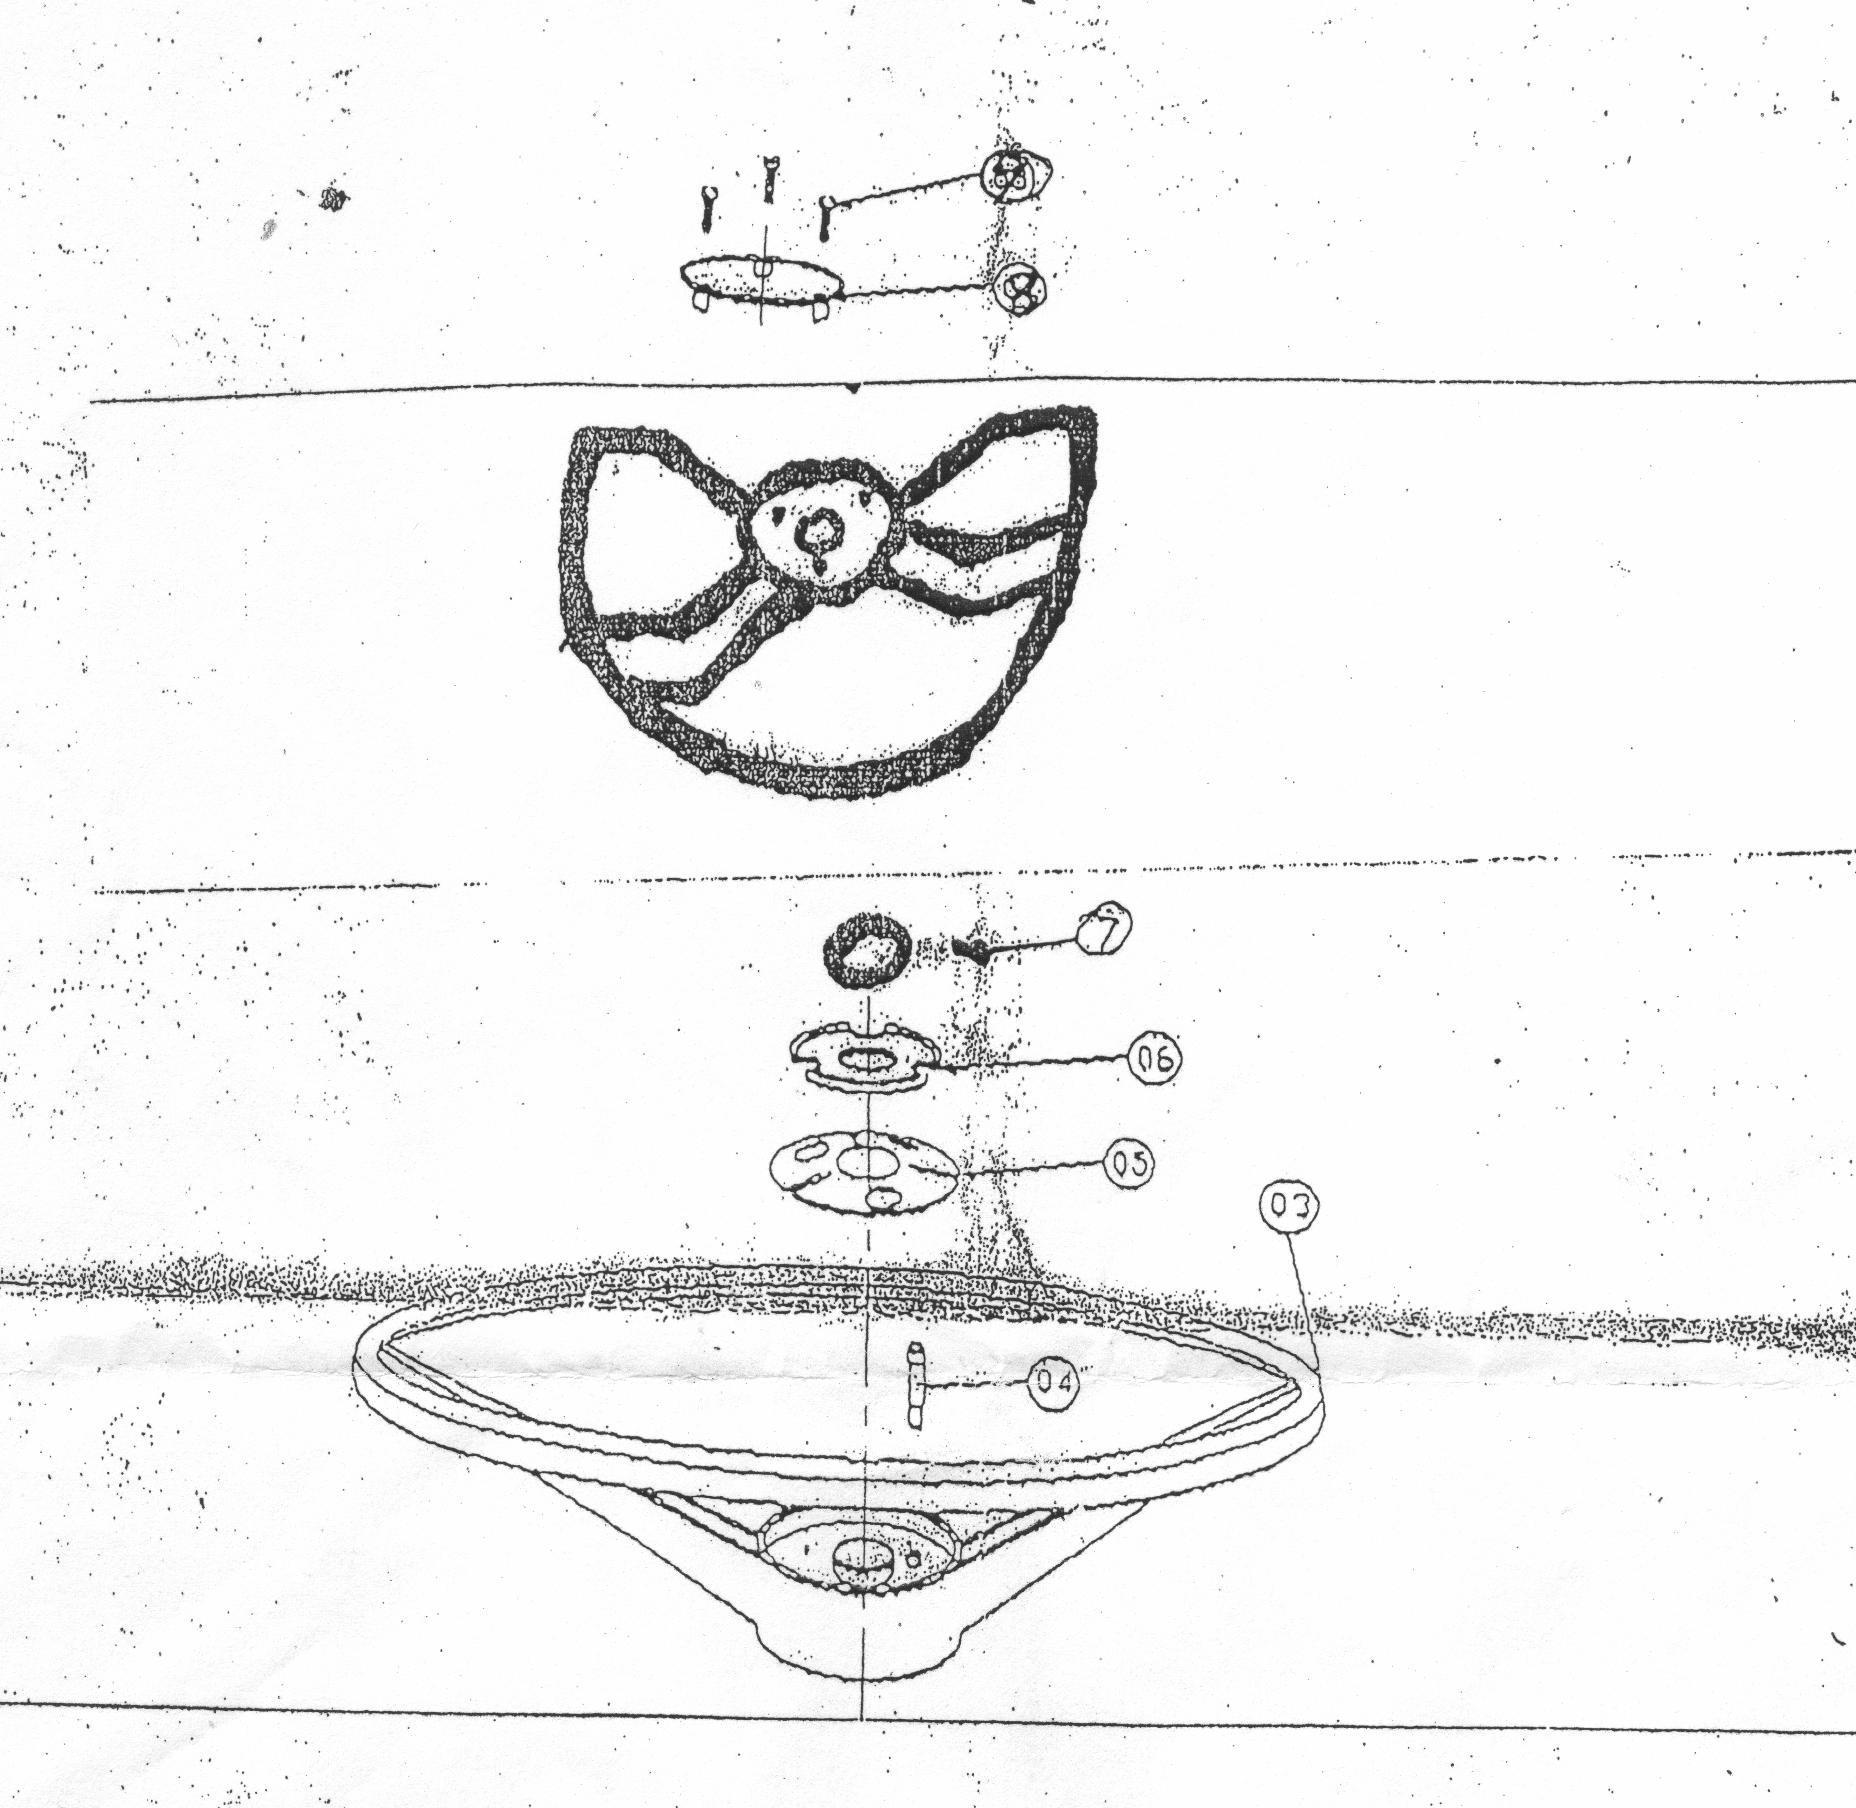 Butterfly Steering Wheel Re Pop Chevy Message Forum Restoration 1949 Styleline Horn Wiring If